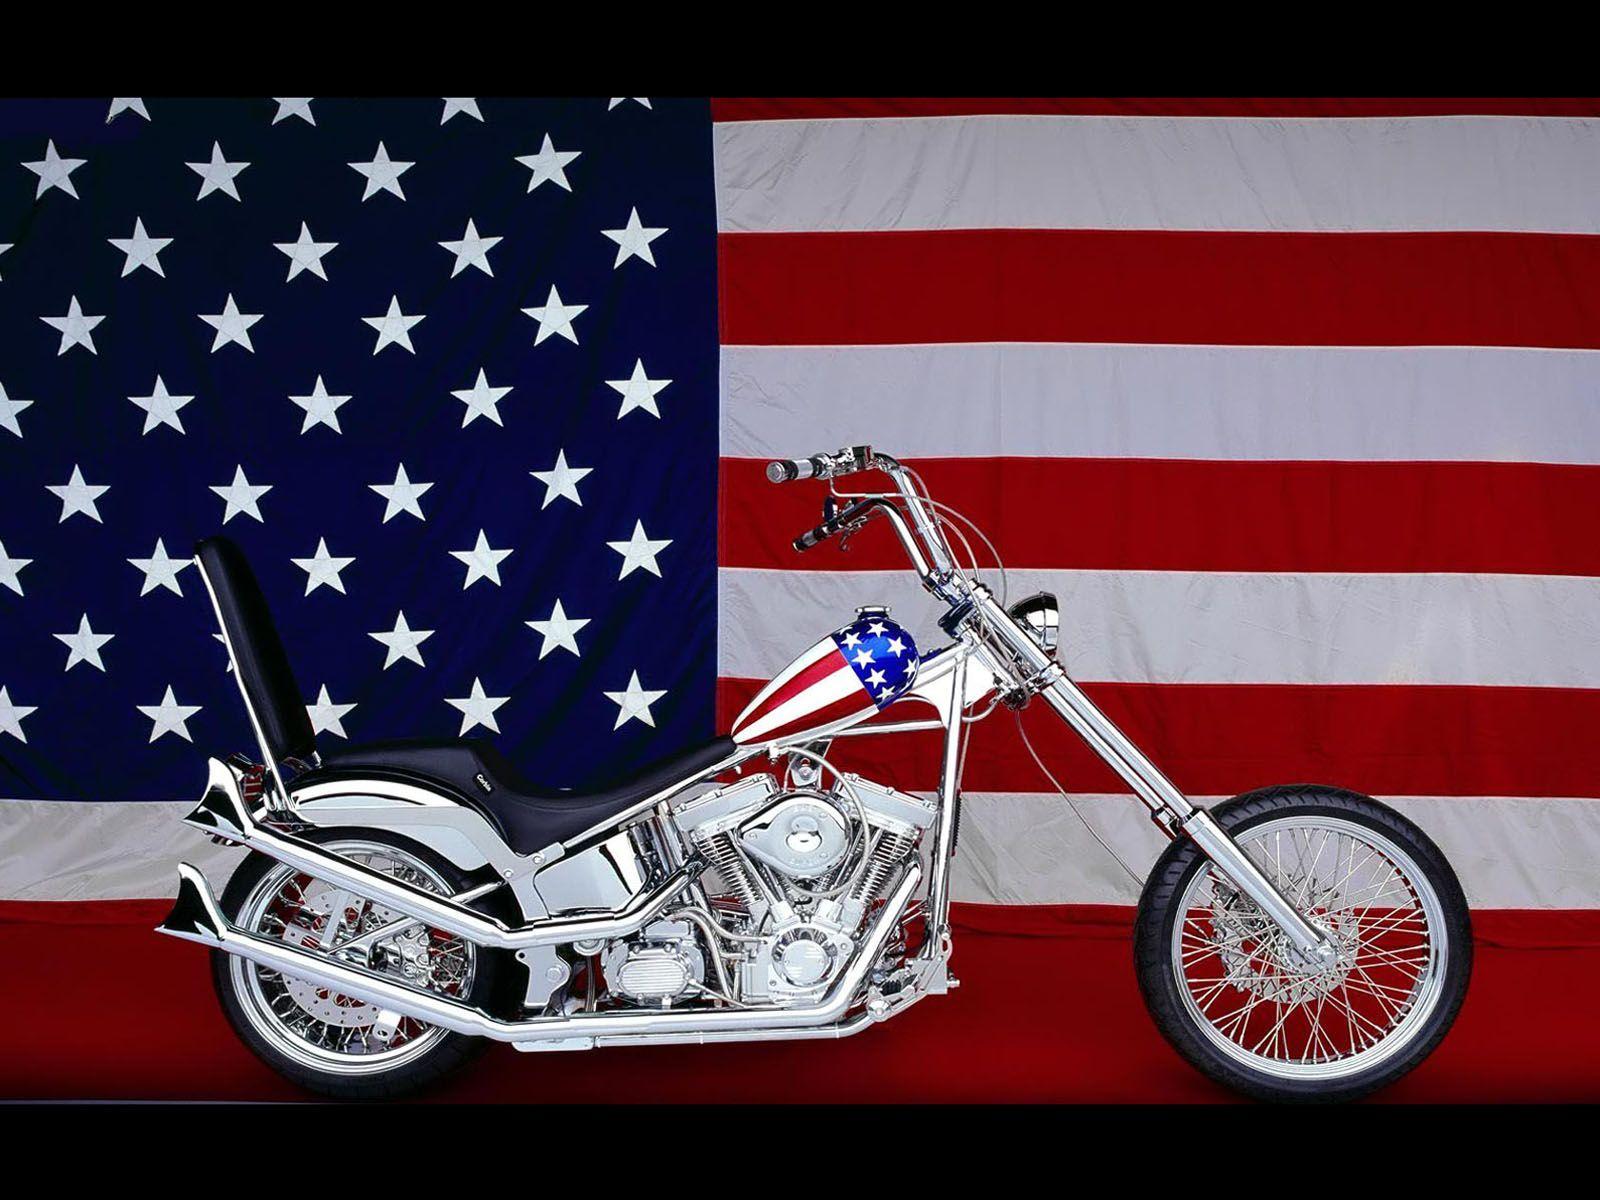 Harley Davidson Photos Download Wallpapers 1600x1000 Free 43